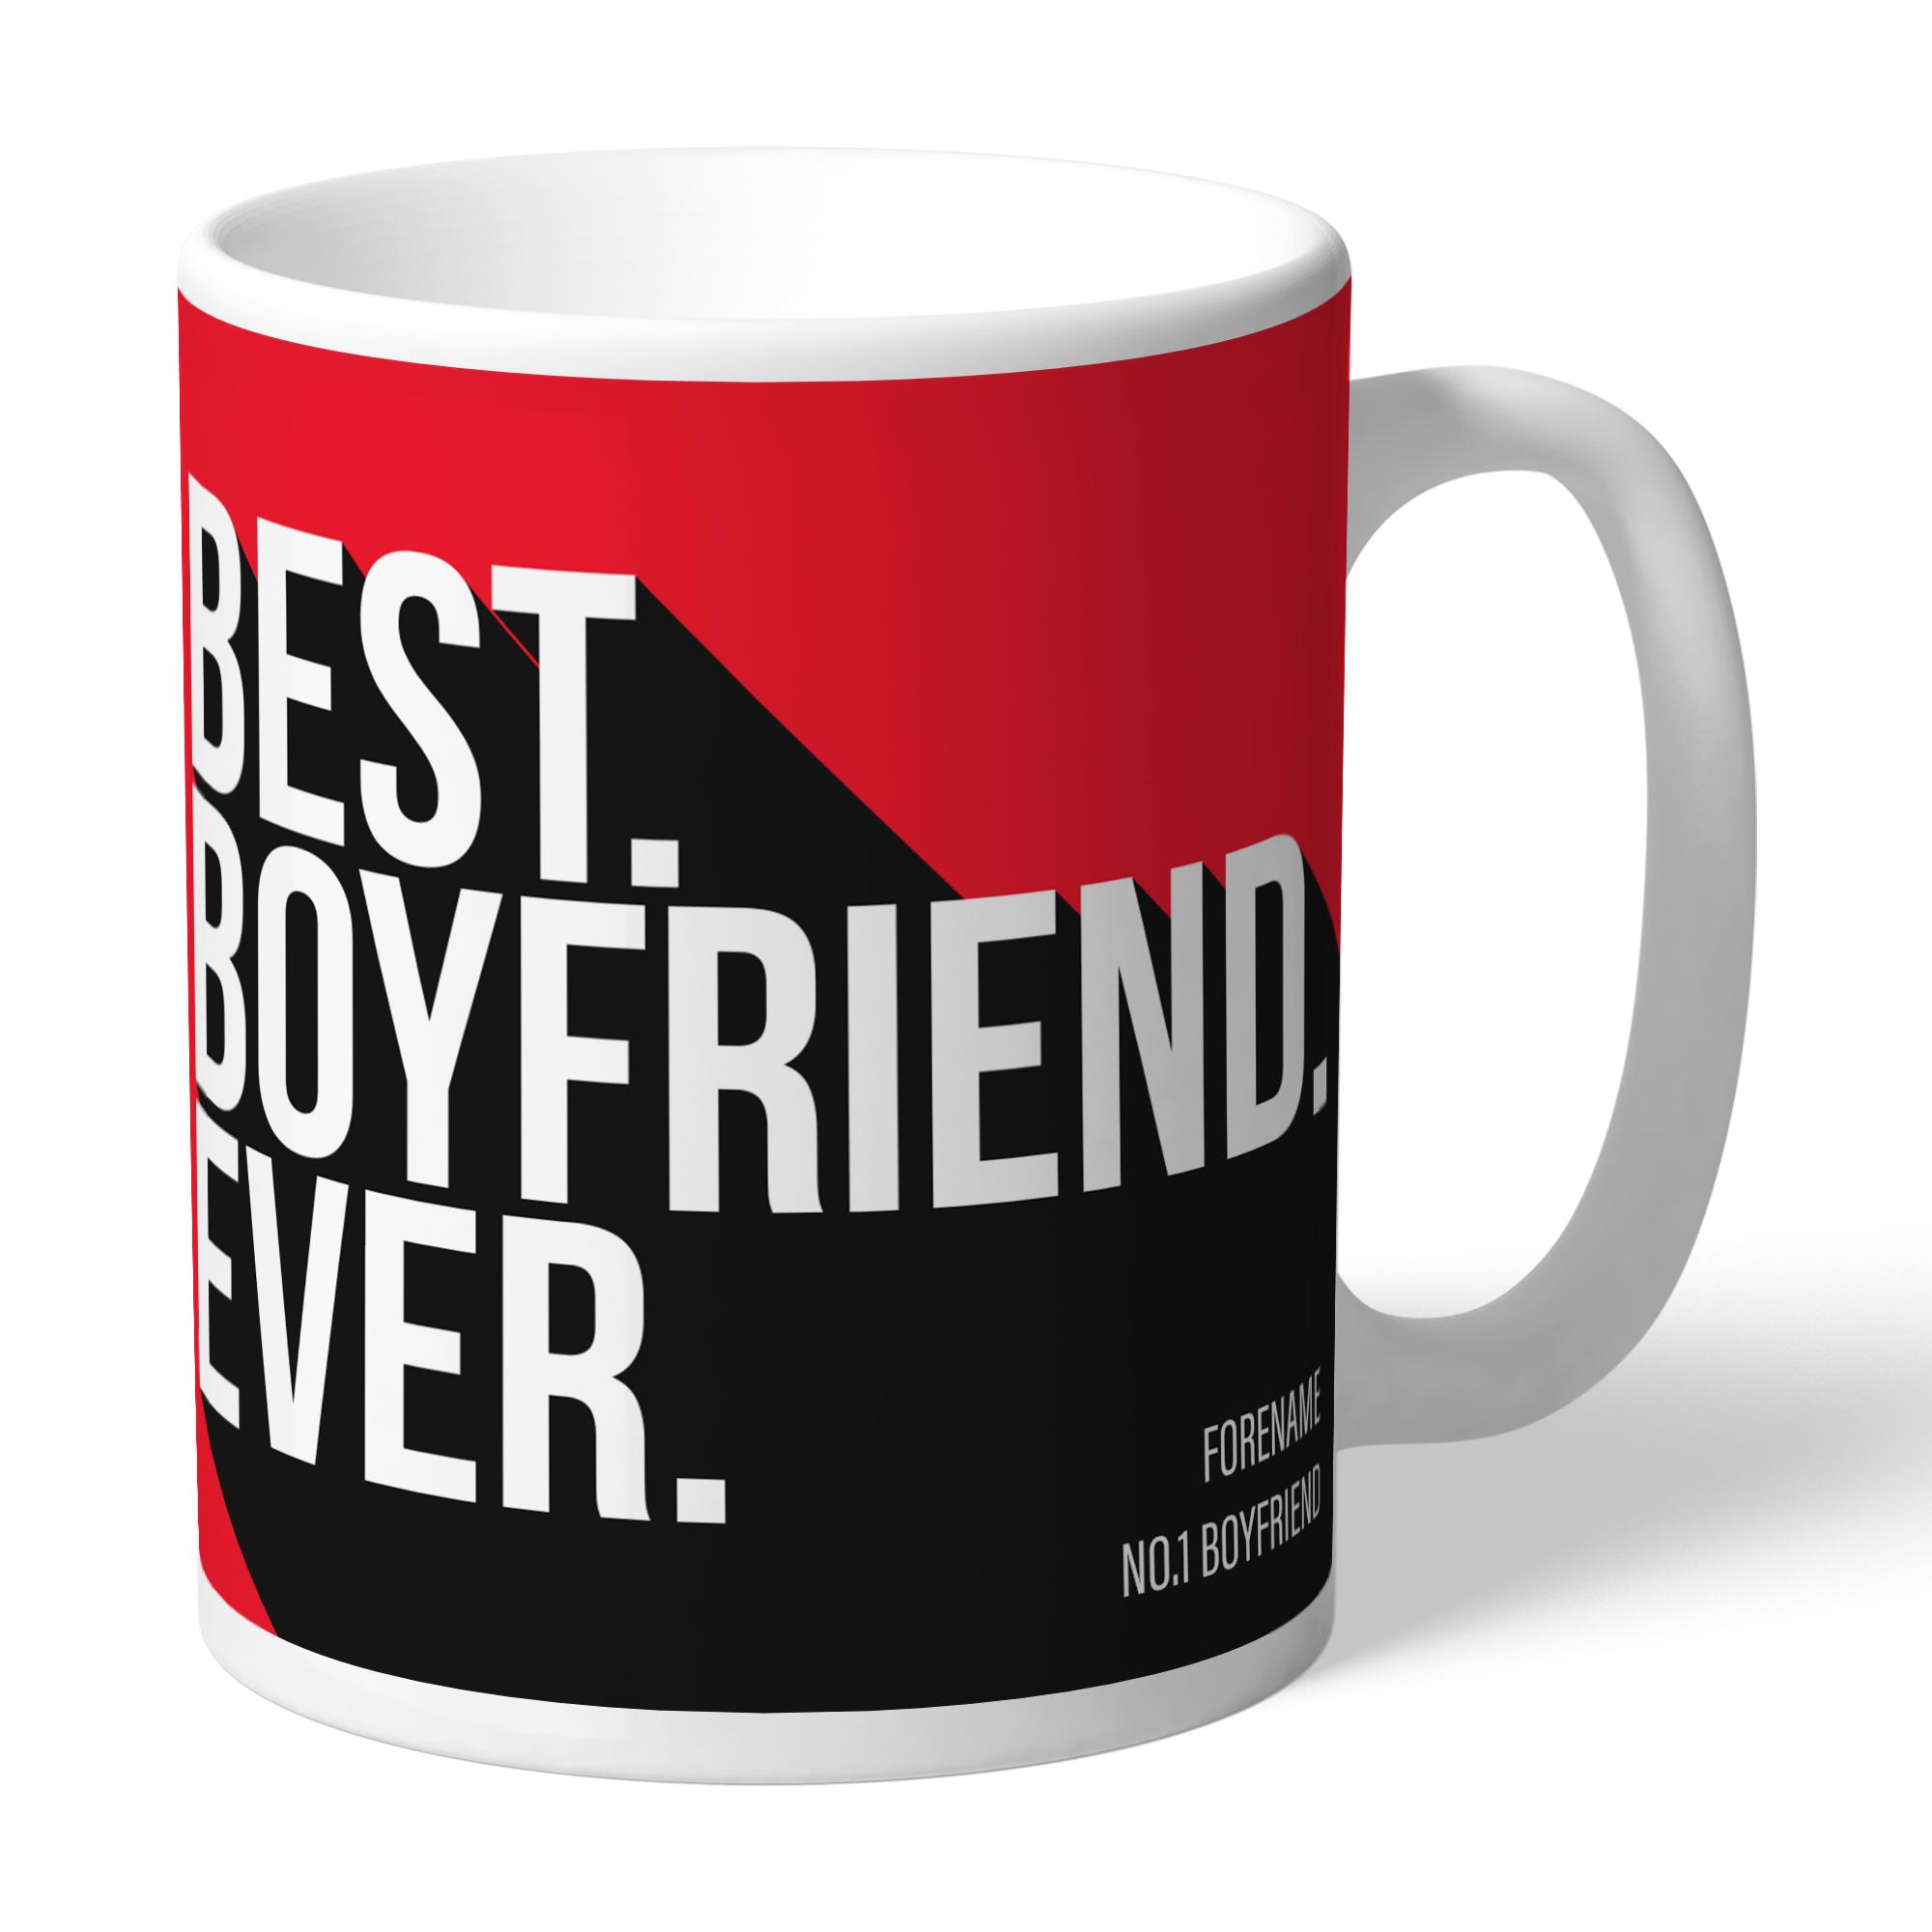 Nottingham Forest Best Boyfriend Ever Mug